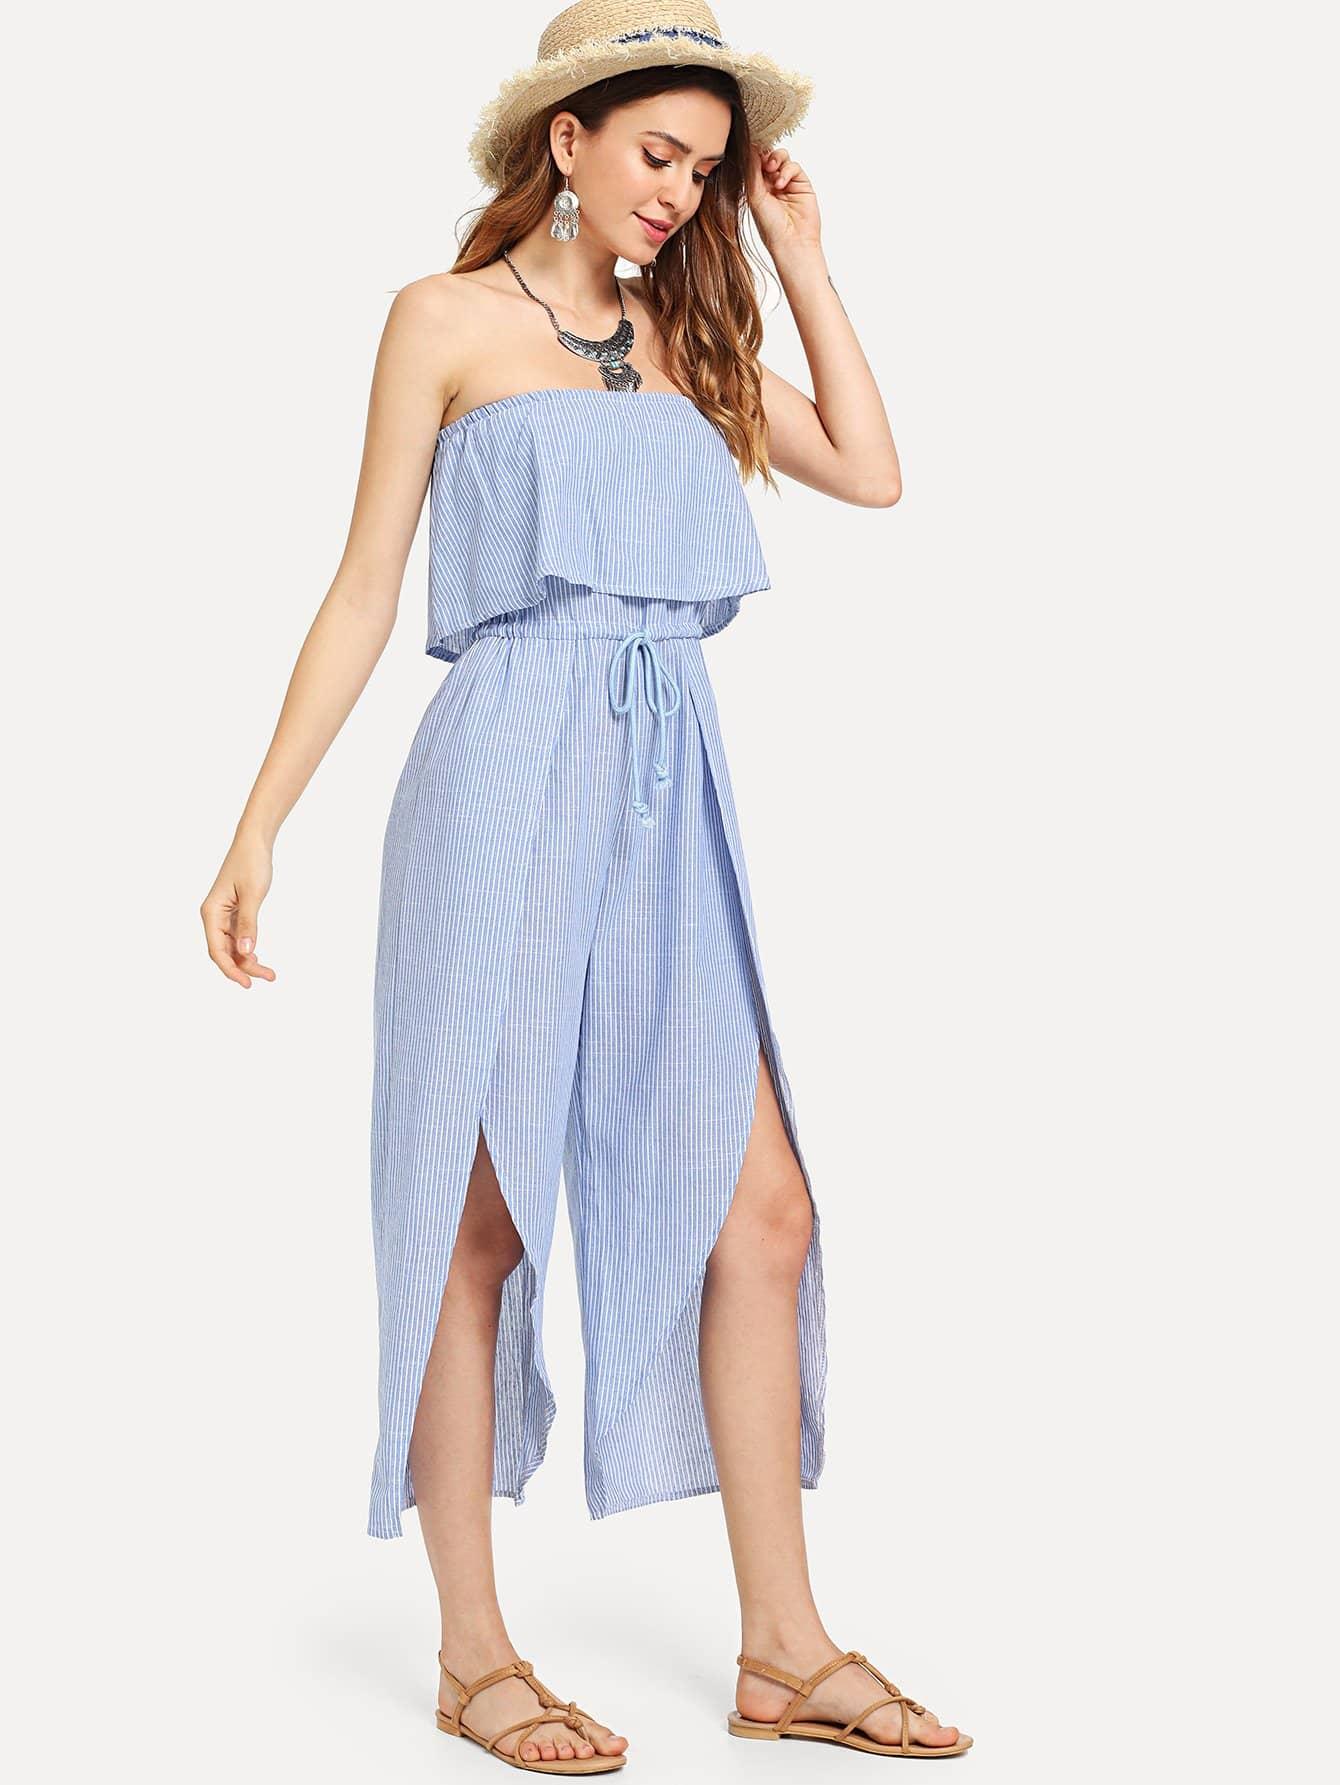 Drawstring Waist Tiered Tube Dress drawstring waist m slit tube dress